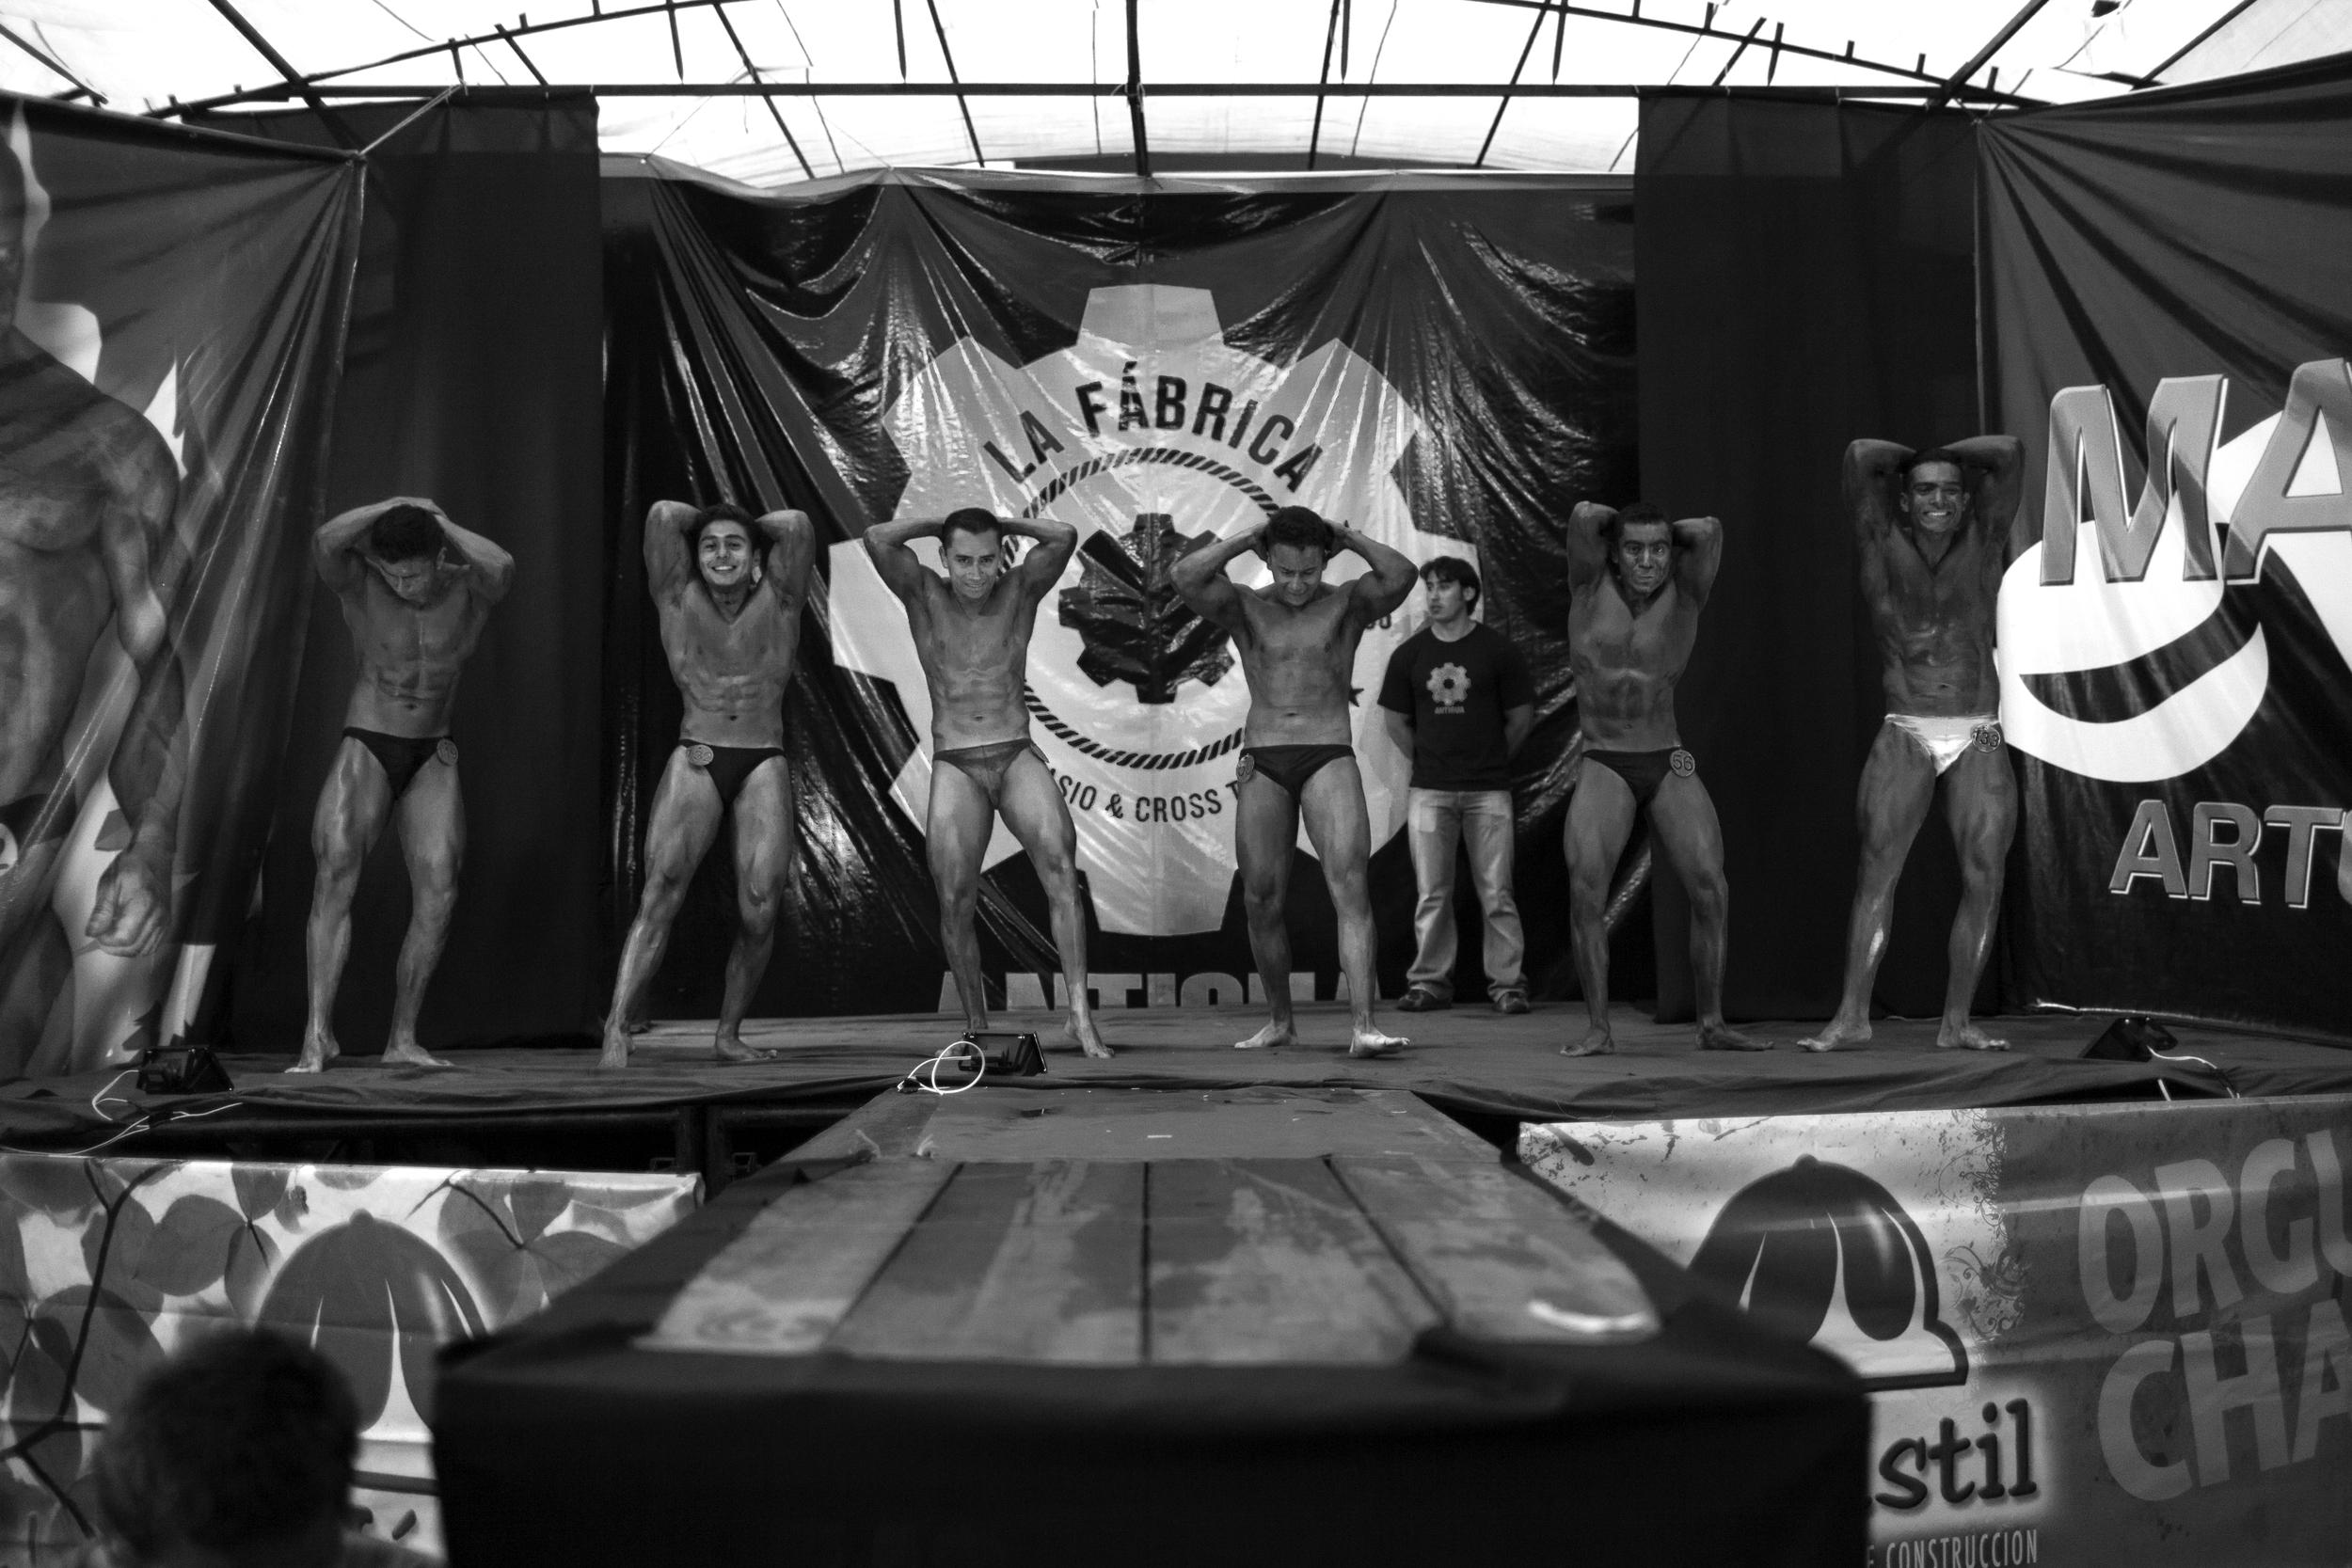 Competitors on stage at the the Gimnasio La Fábrica bodybuilding contest in Antigua, Guatemala.